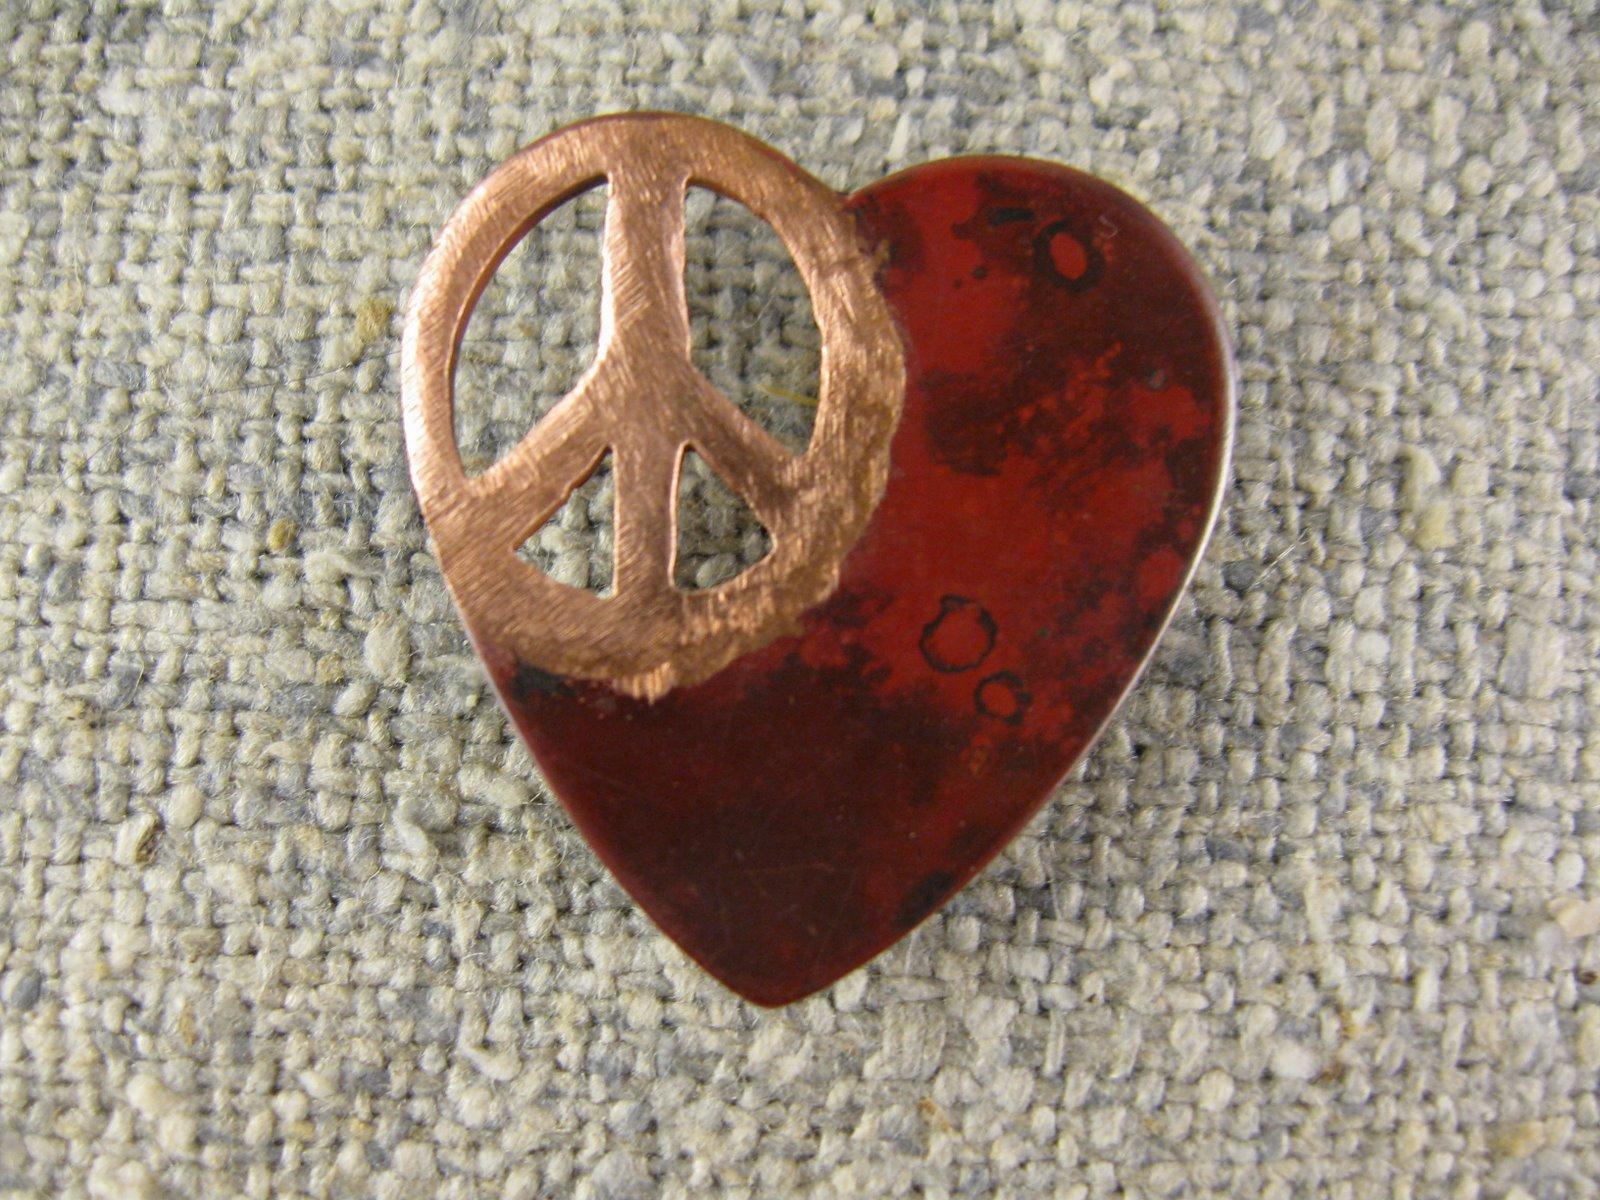 small peaceful heart (tac pin)